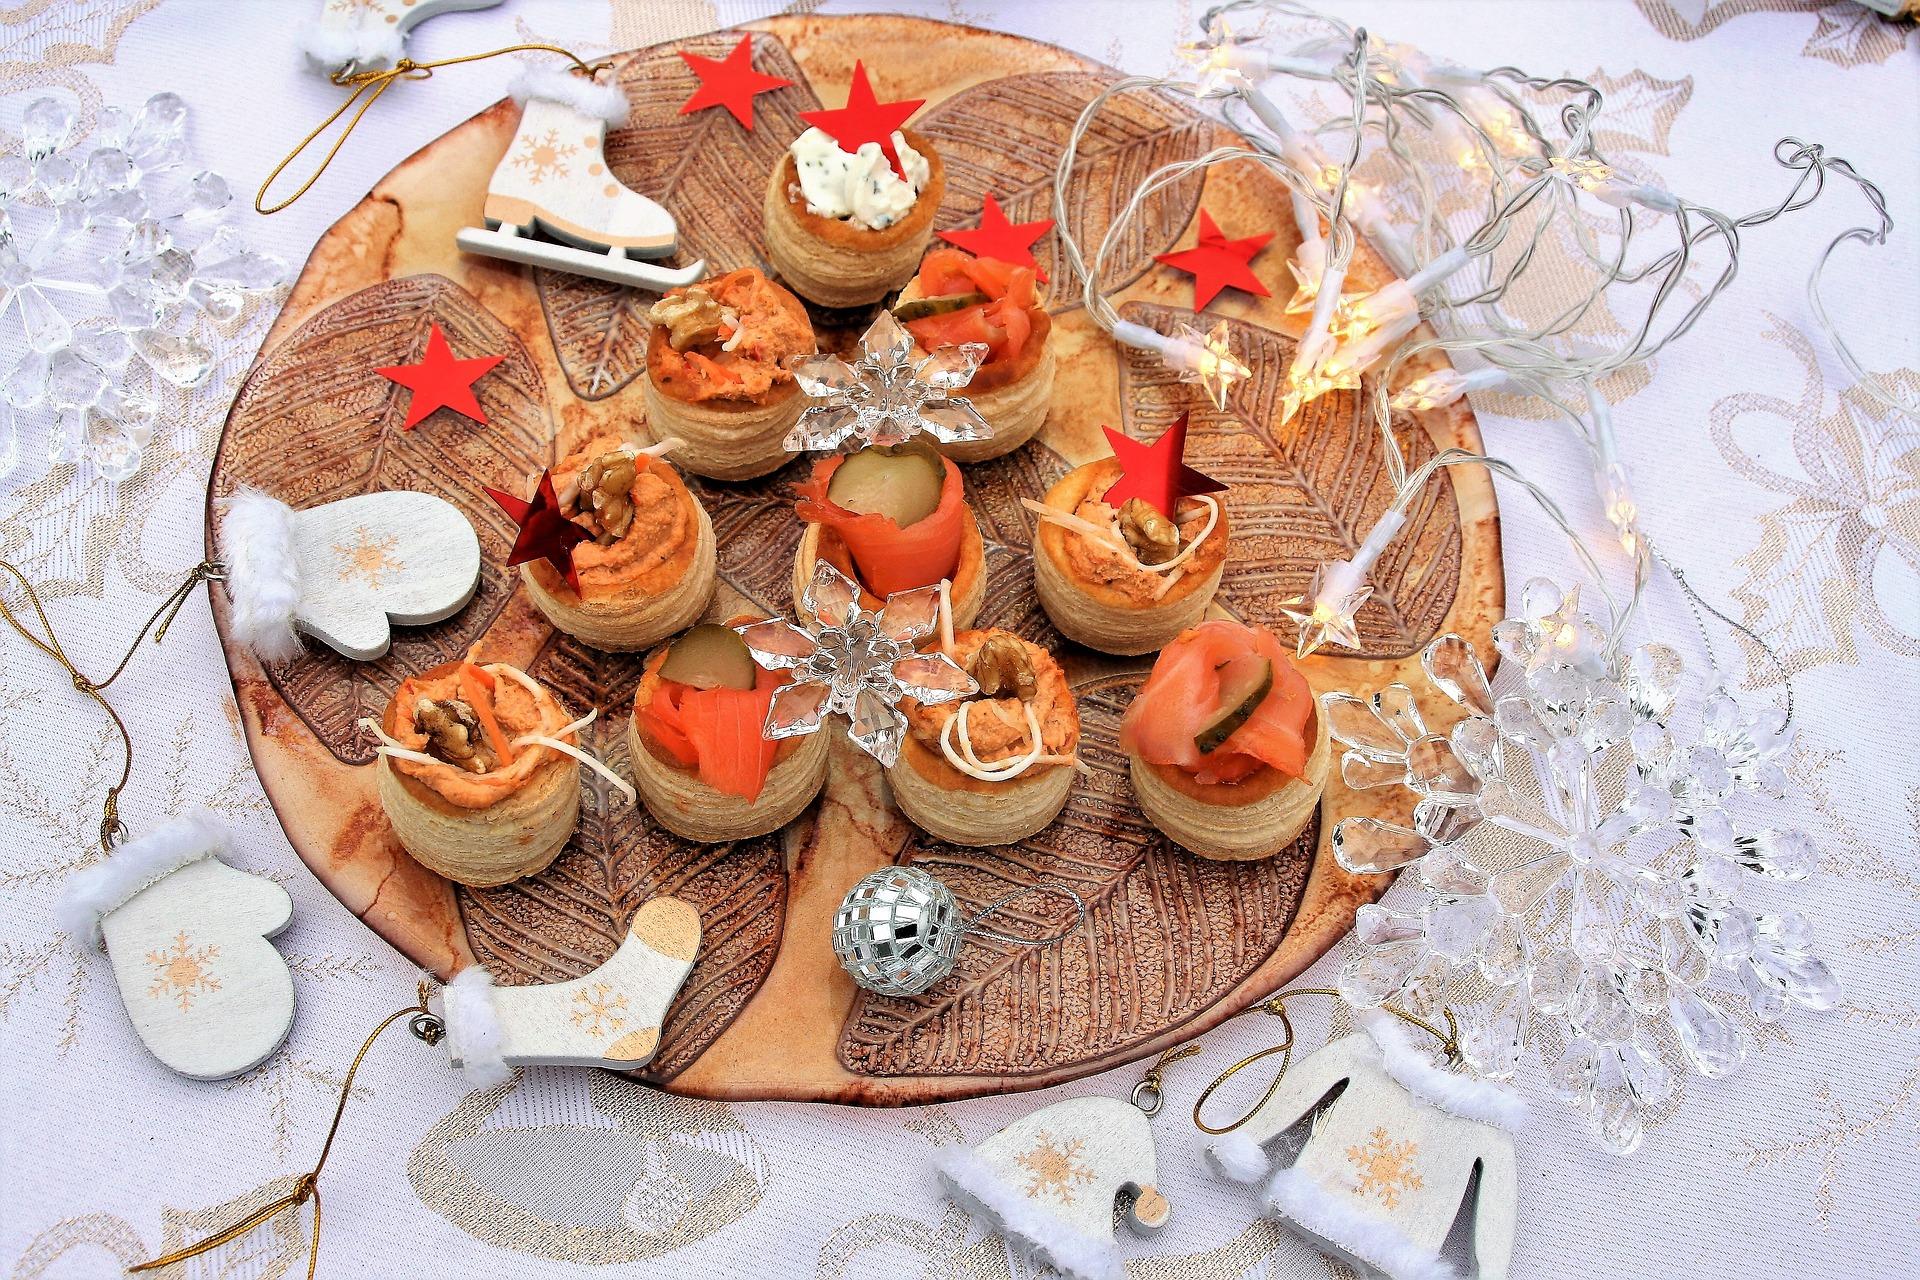 Repas De Noel Simple Festif Et Rapide Simplement Organisee